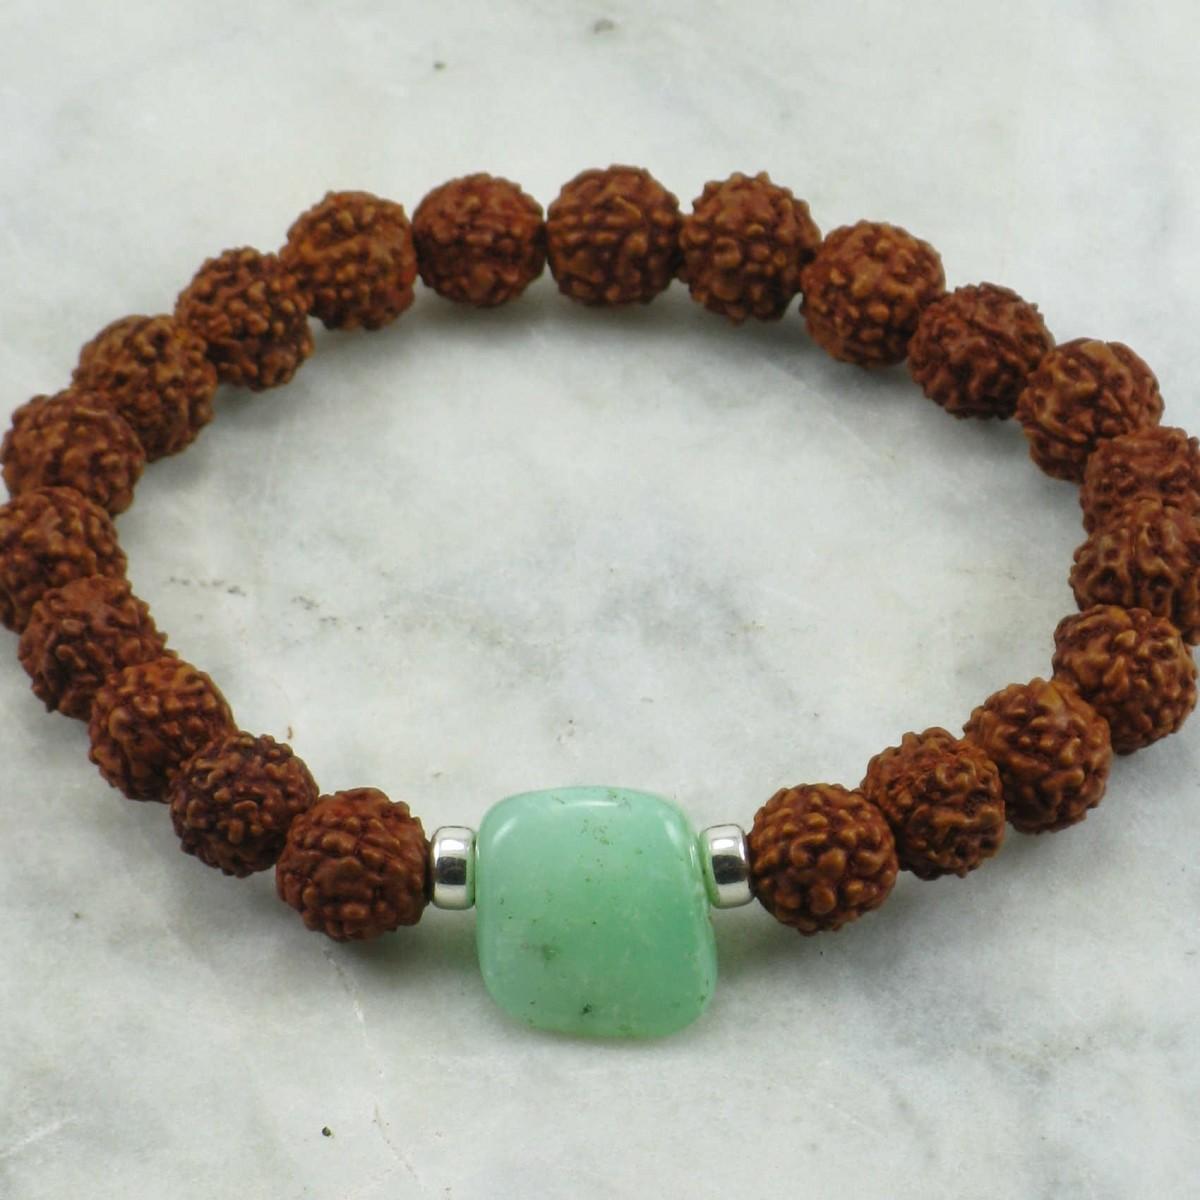 Love_Mala_Bracelet_21_Rudraksha _Mala_Beads_Buddhist_Bracelet